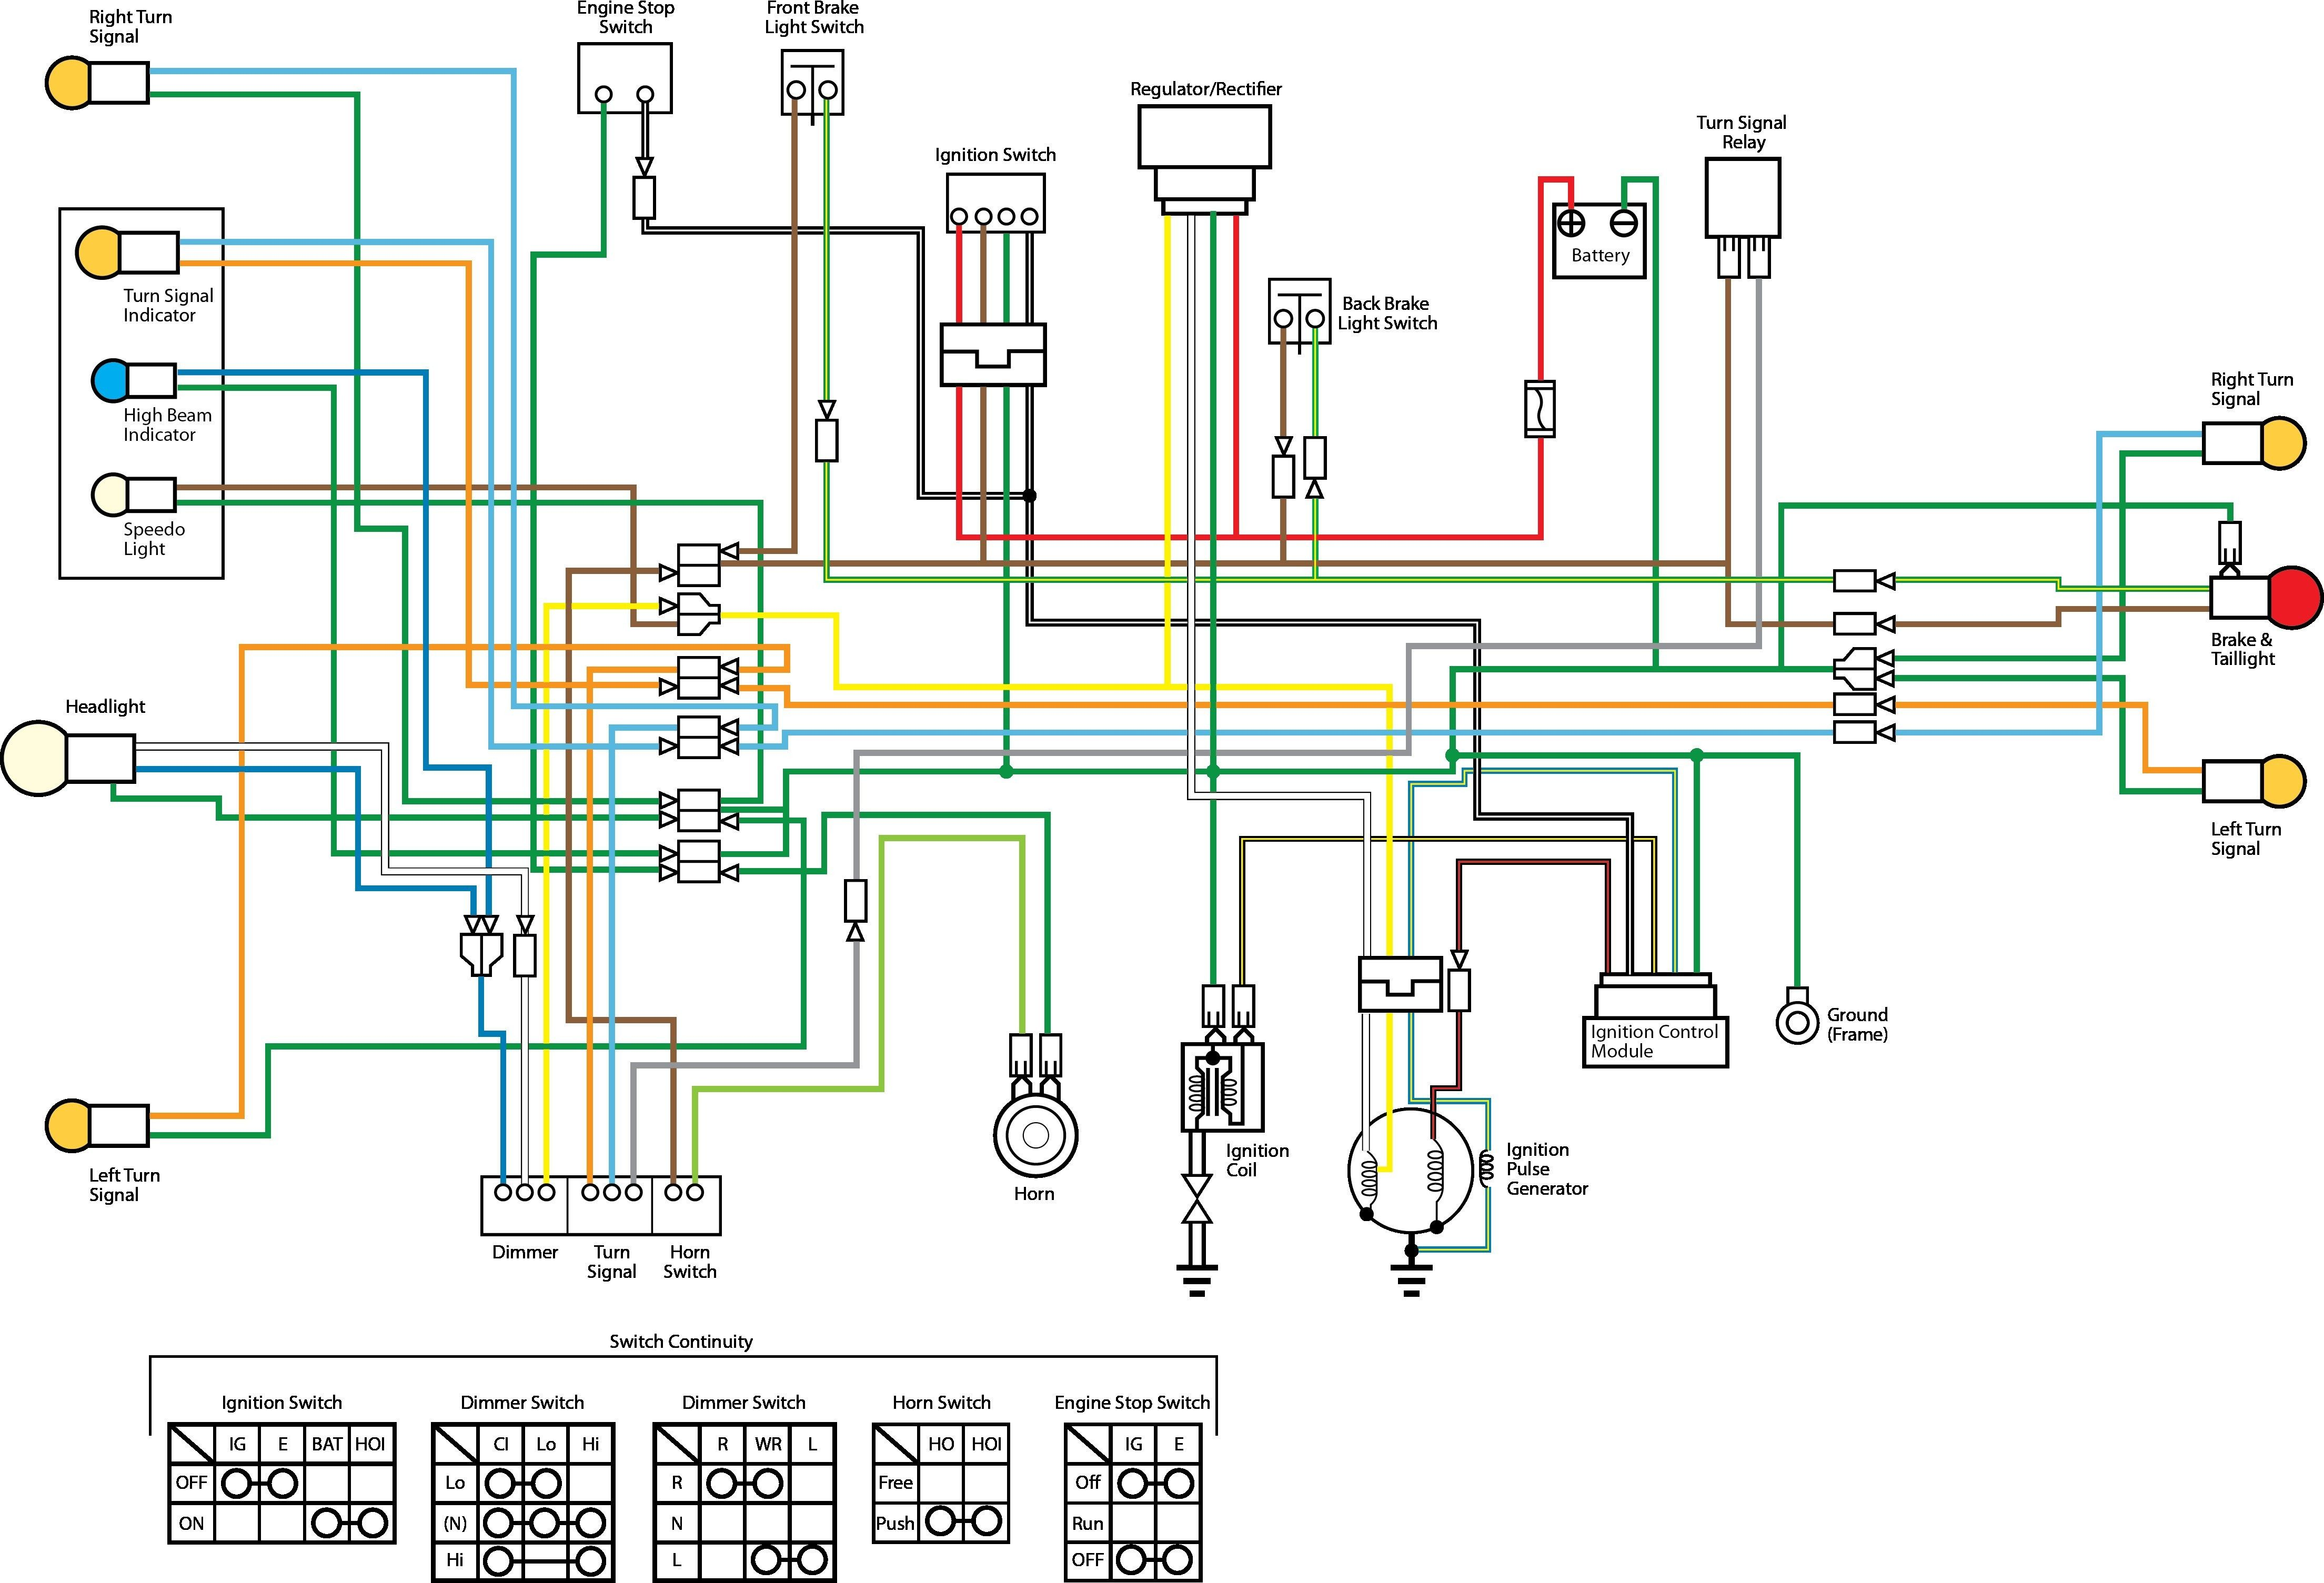 New Building Wiring #diagram #wiringdiagram #diagramming #Diagramm #visuals  #visualisation #grap… | Motorcycle wiring, Electrical wiring diagram, Electrical  diagramPinterest